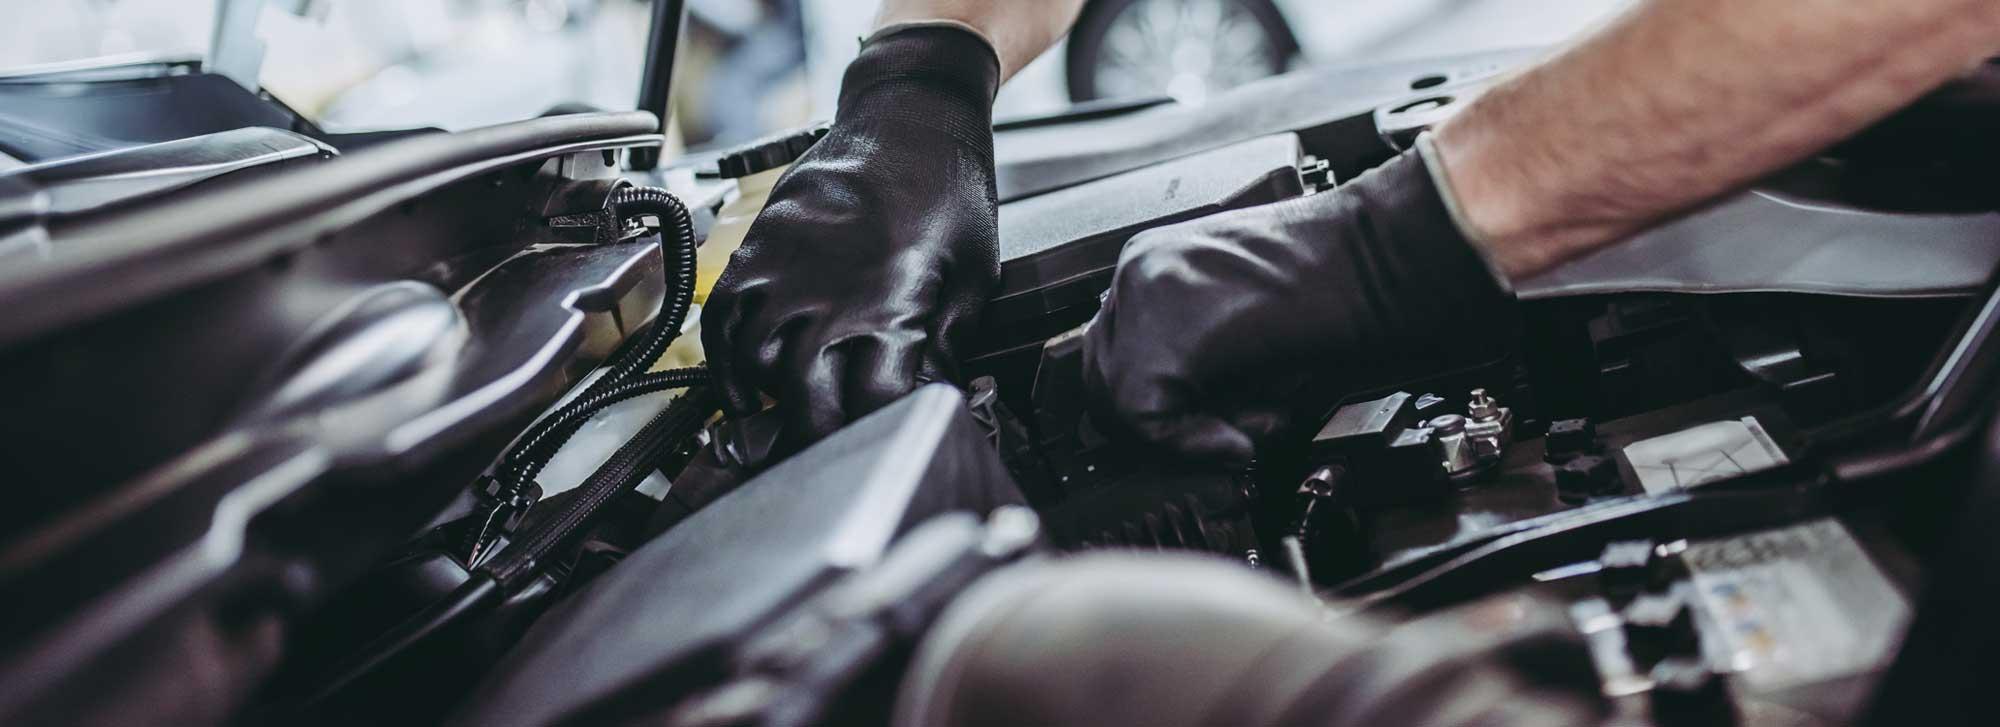 Fuel Pumps & Carburettor Equipment